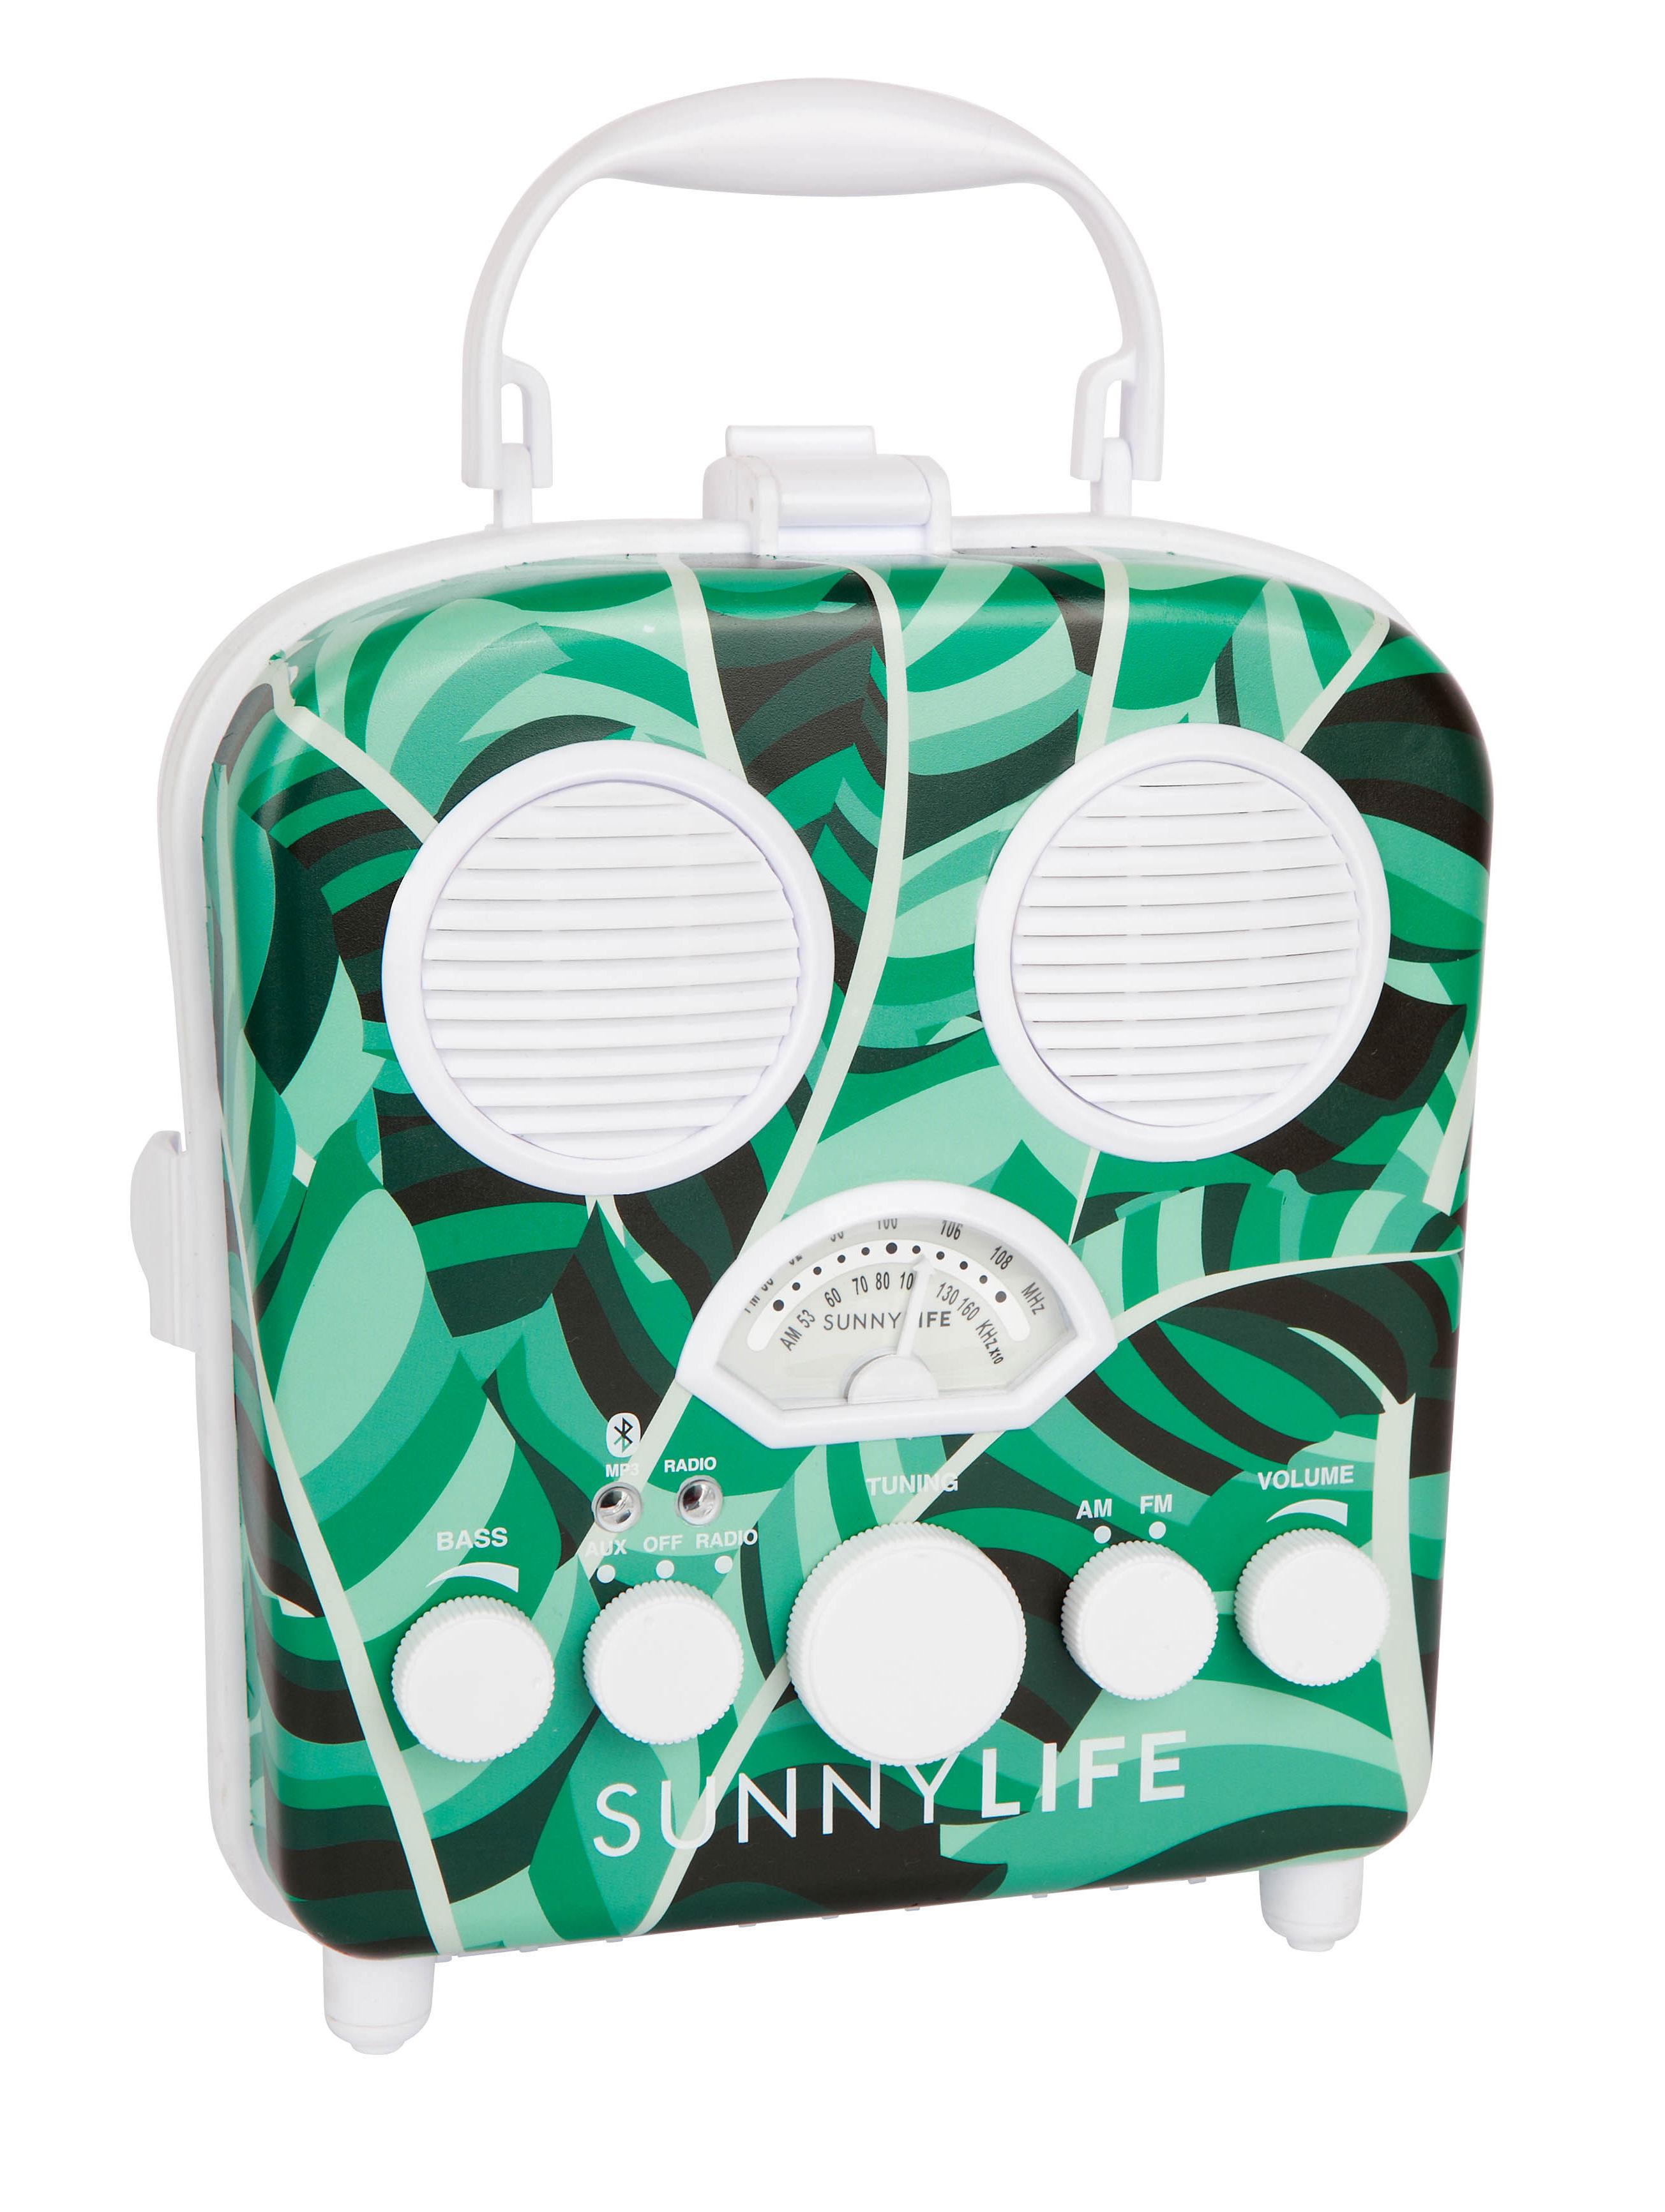 Decoration - Children's Home Accessories - Banana Palm Wireless speakers - / Speaker - Waterproof by Sunnylife - Banana tree / Green & white - Foam, Plastic material